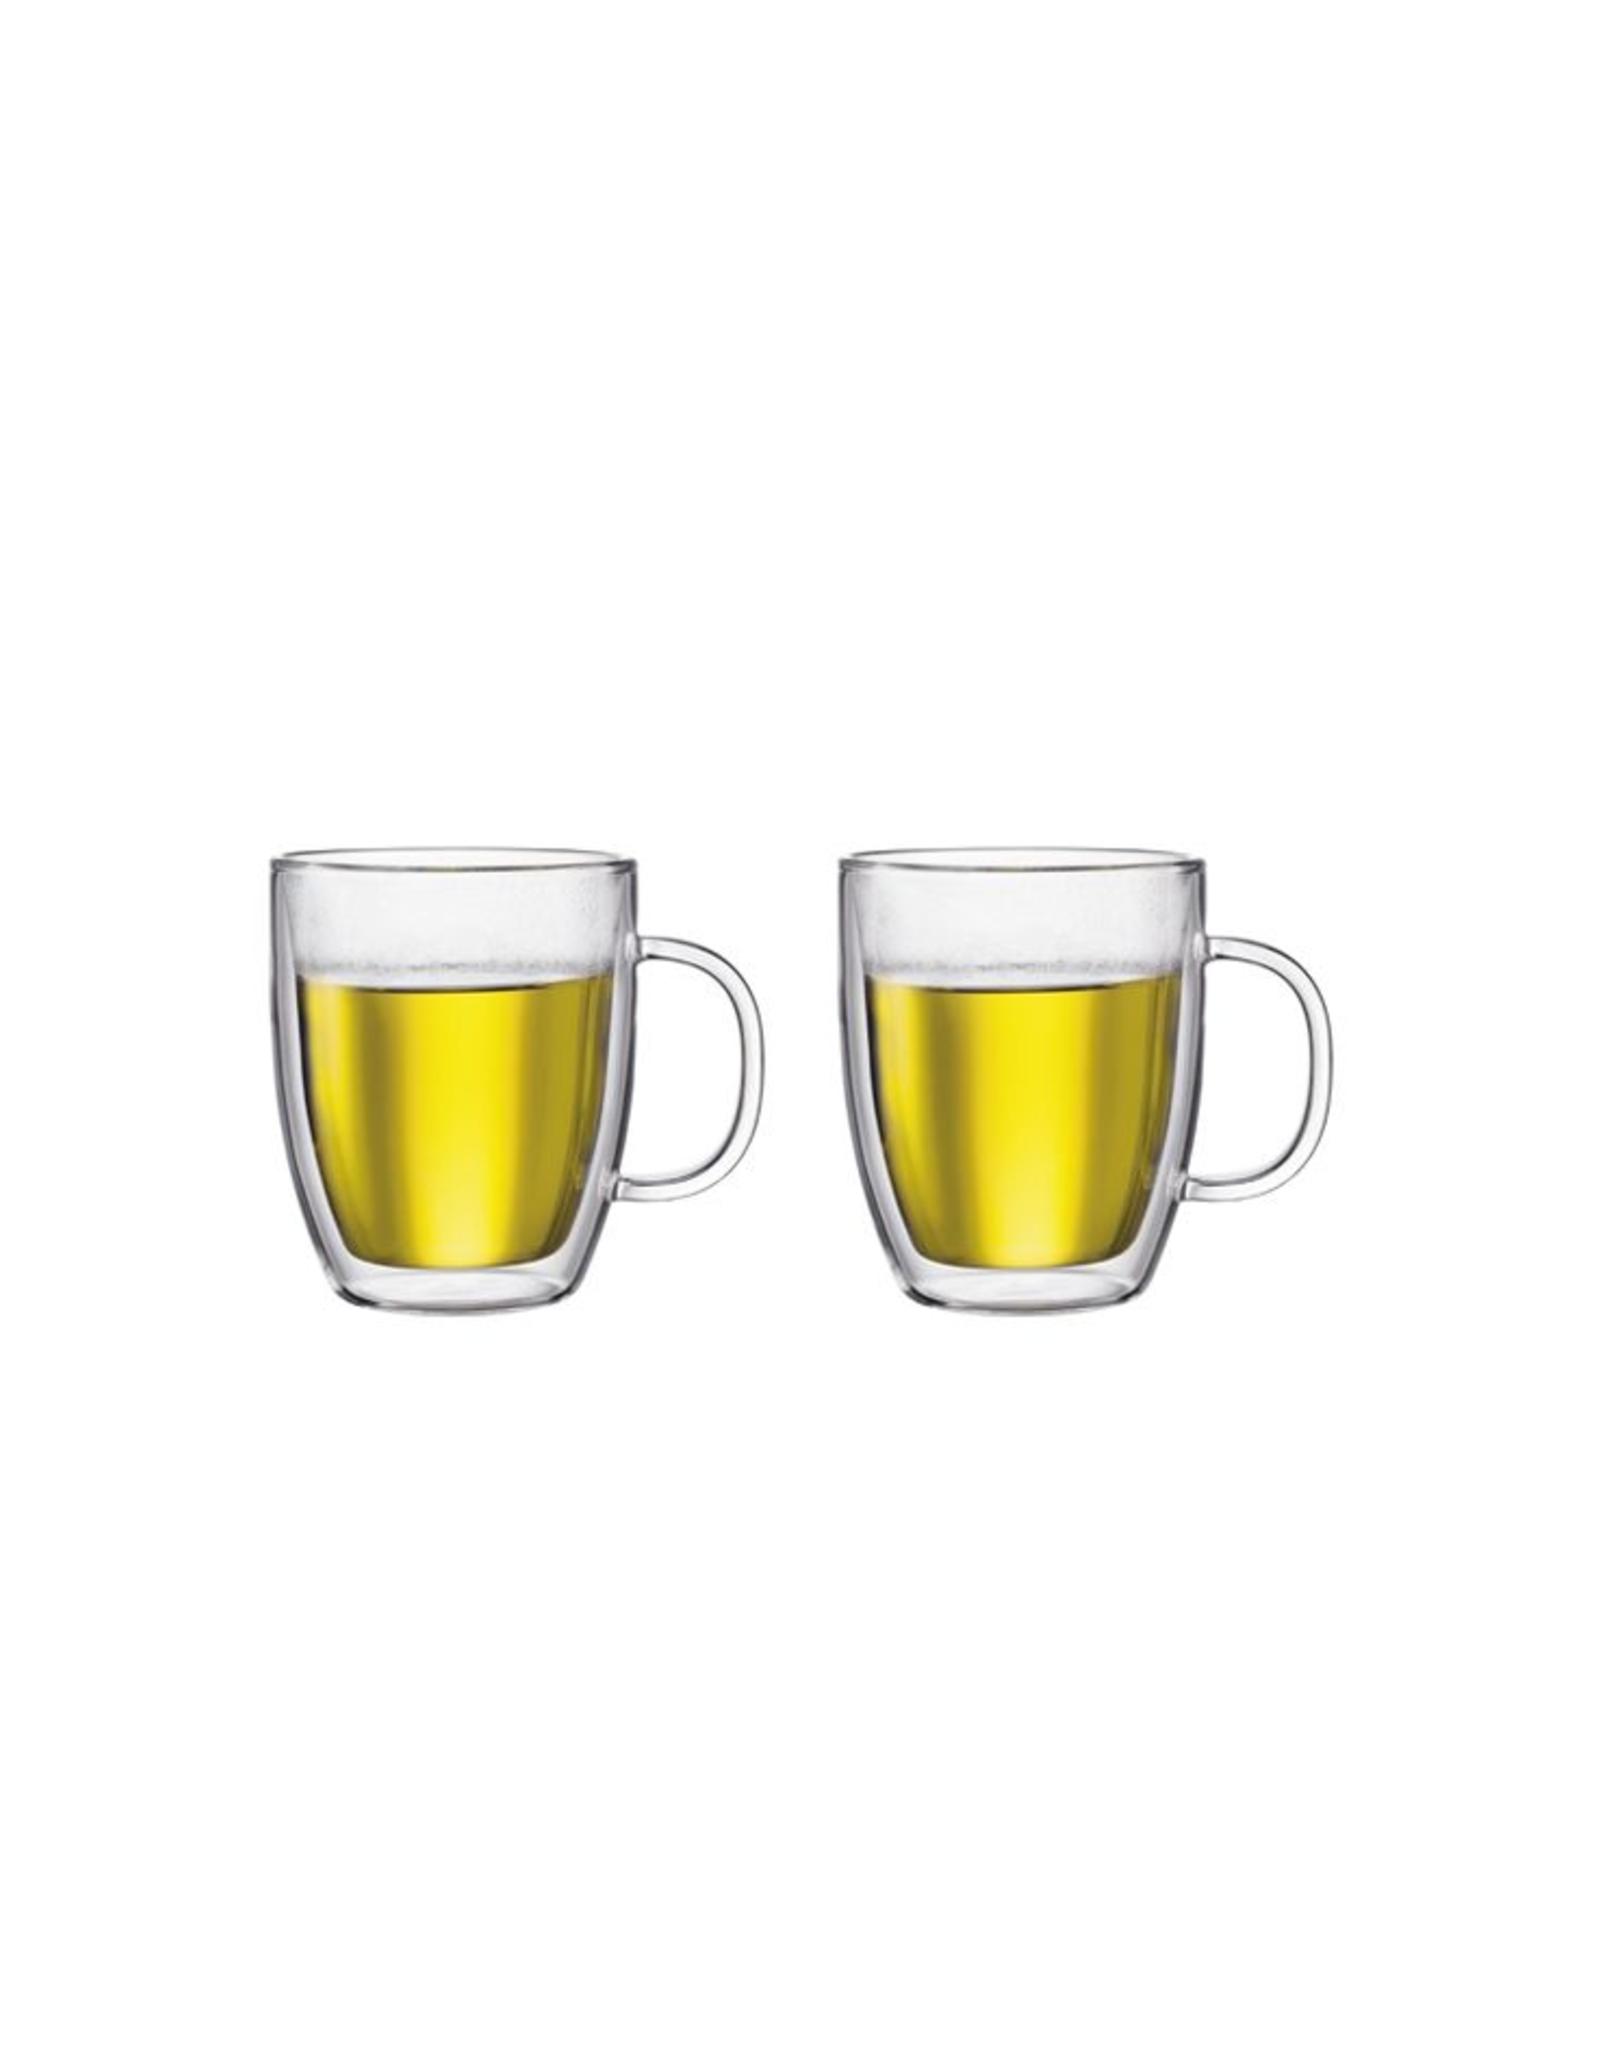 Bodum Bistro Glasses 15 oz